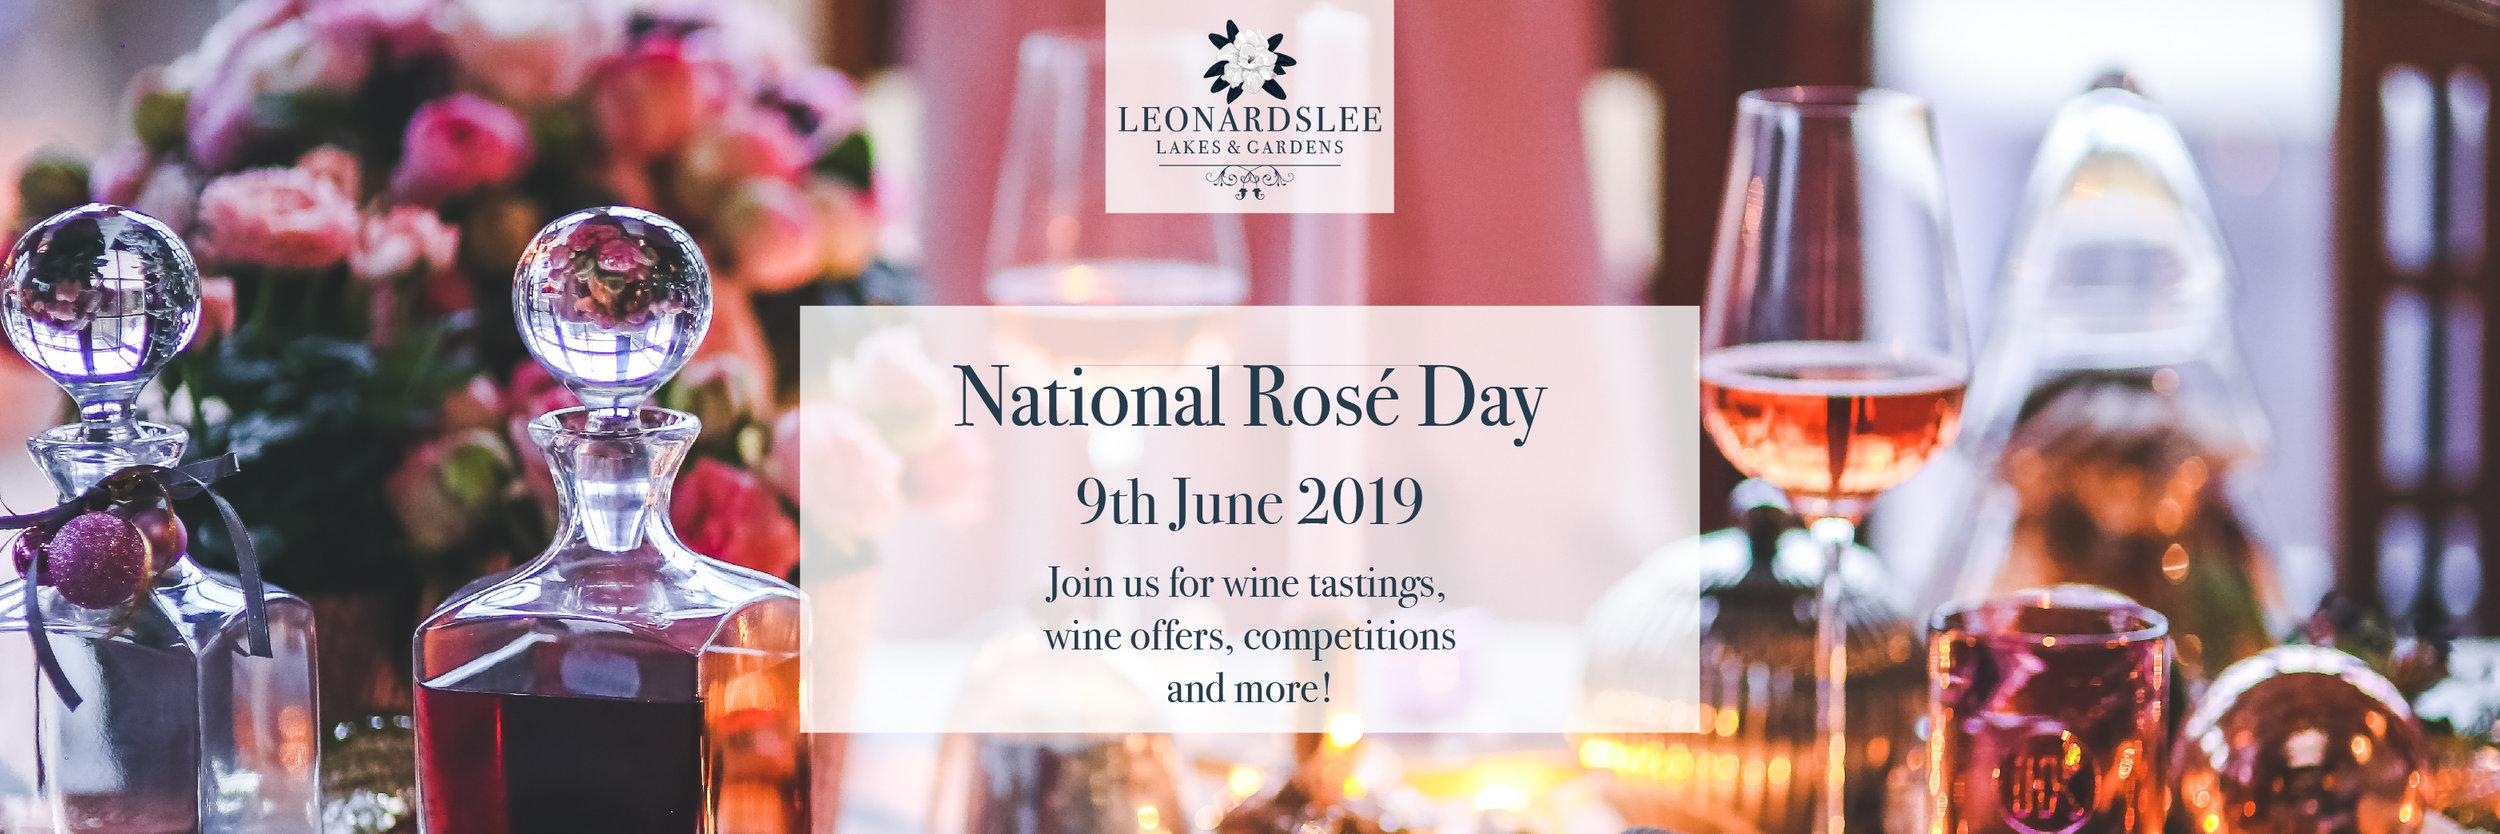 rose leonardslee